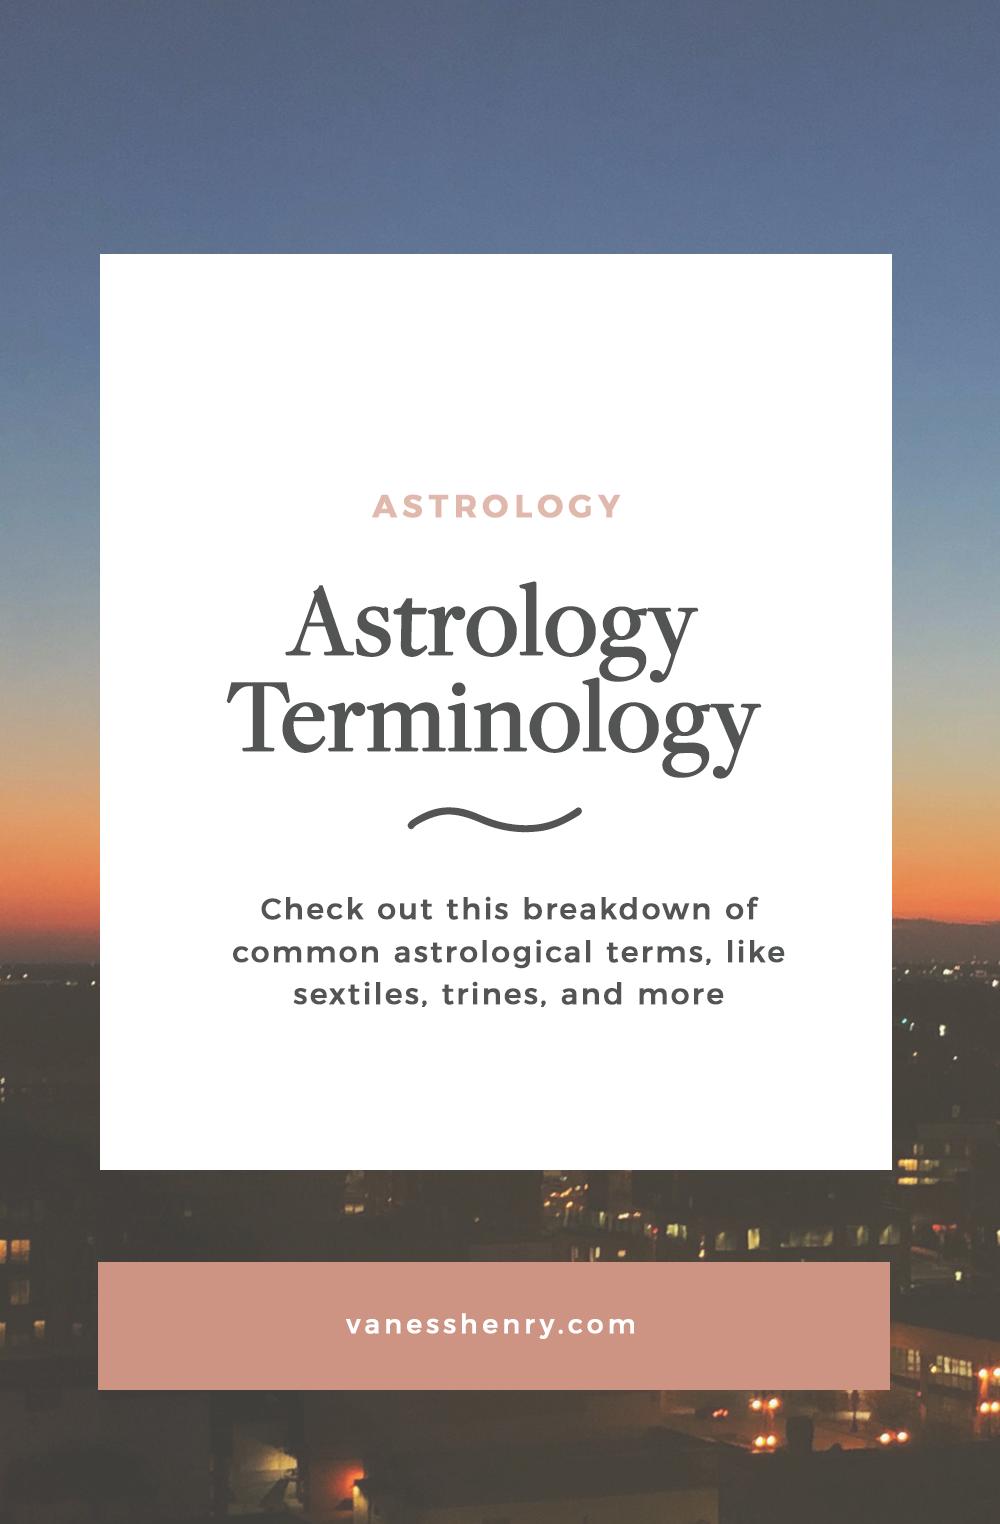 Astrology Terminology 101 | Vaness Henry